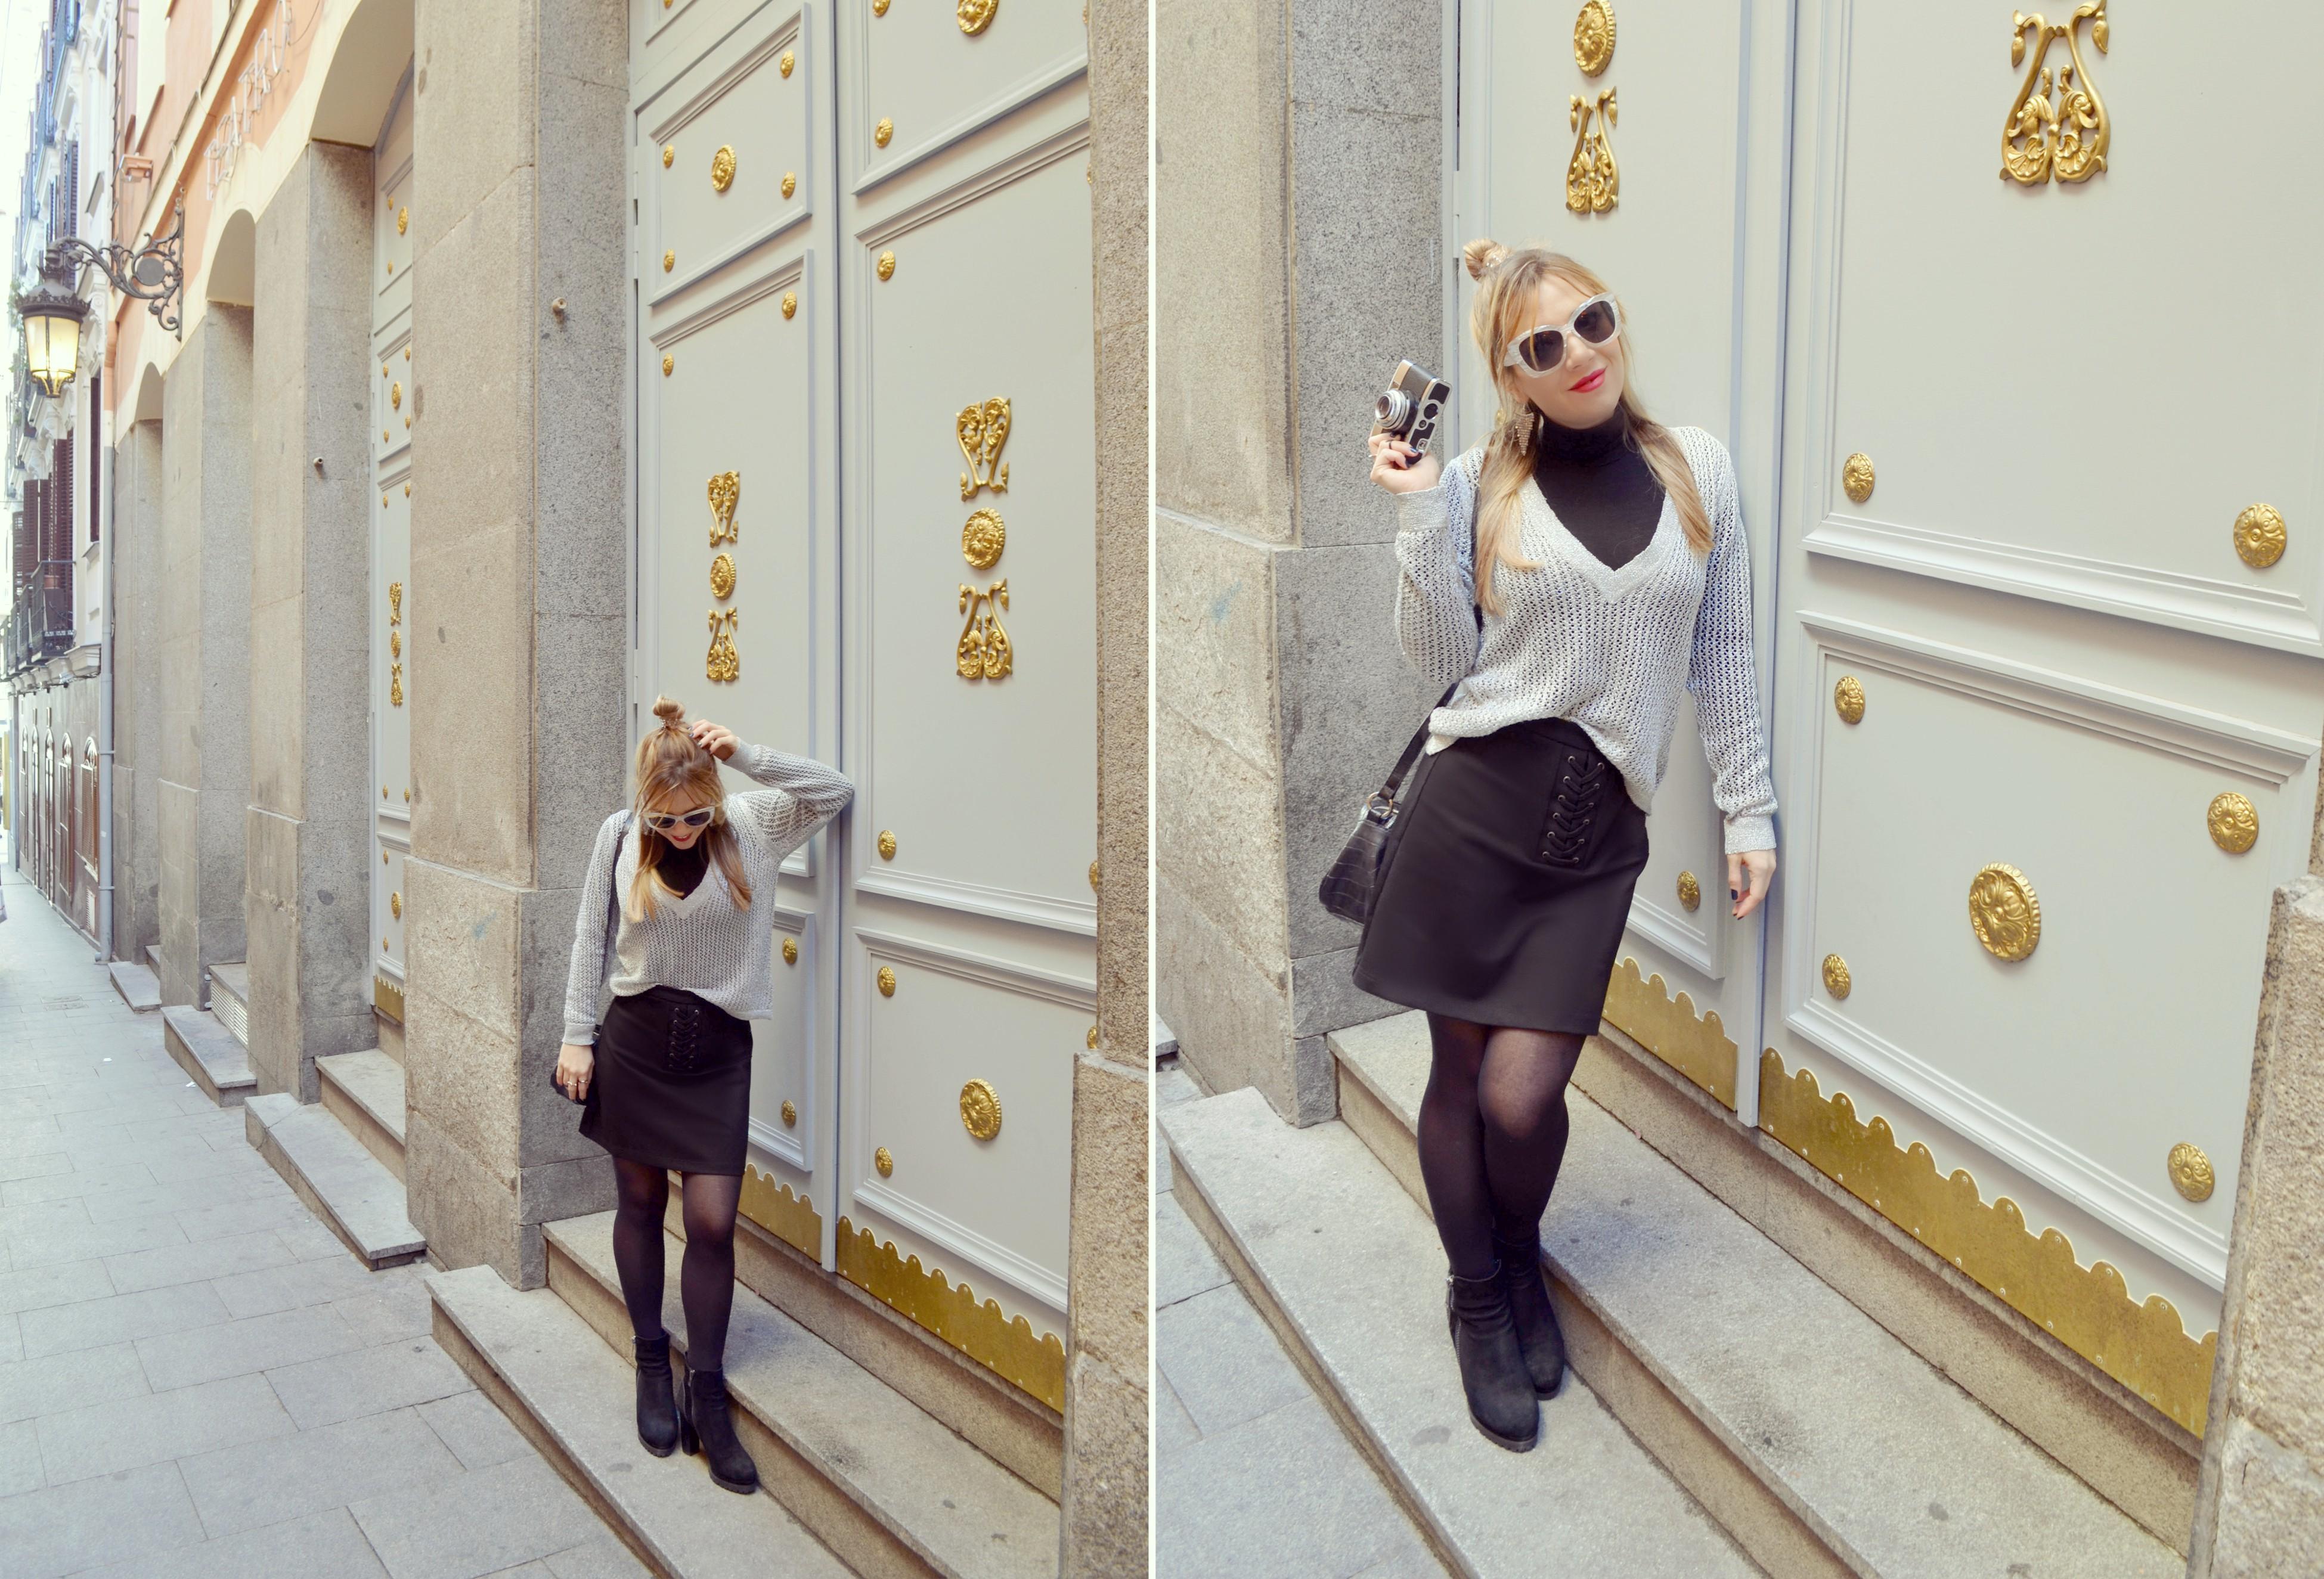 ChicAdicta-blog-de-moda-fashionista-ChicAdicta-Amichi-Madrid-street-style-botines-AlmaenPena-shoes-black-booties-PiensaenChic-Piensa-en-Chic